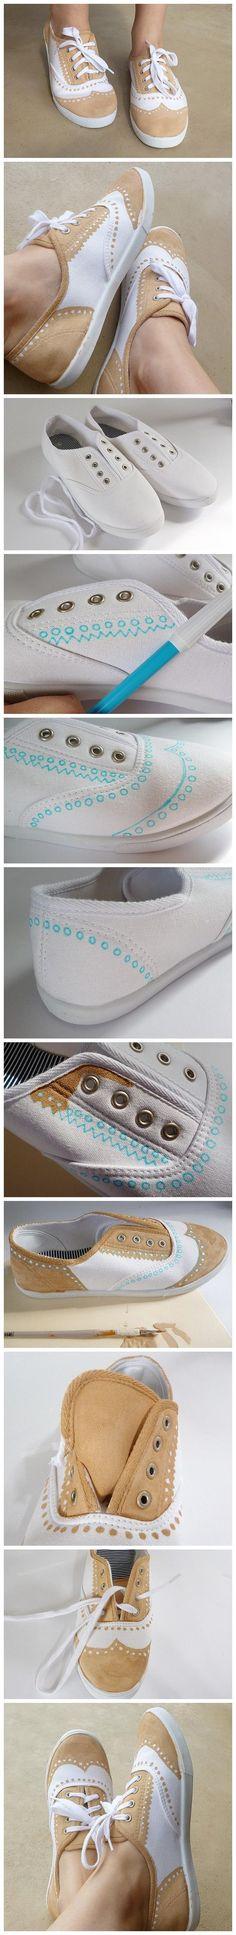 Decoración para zapatillas